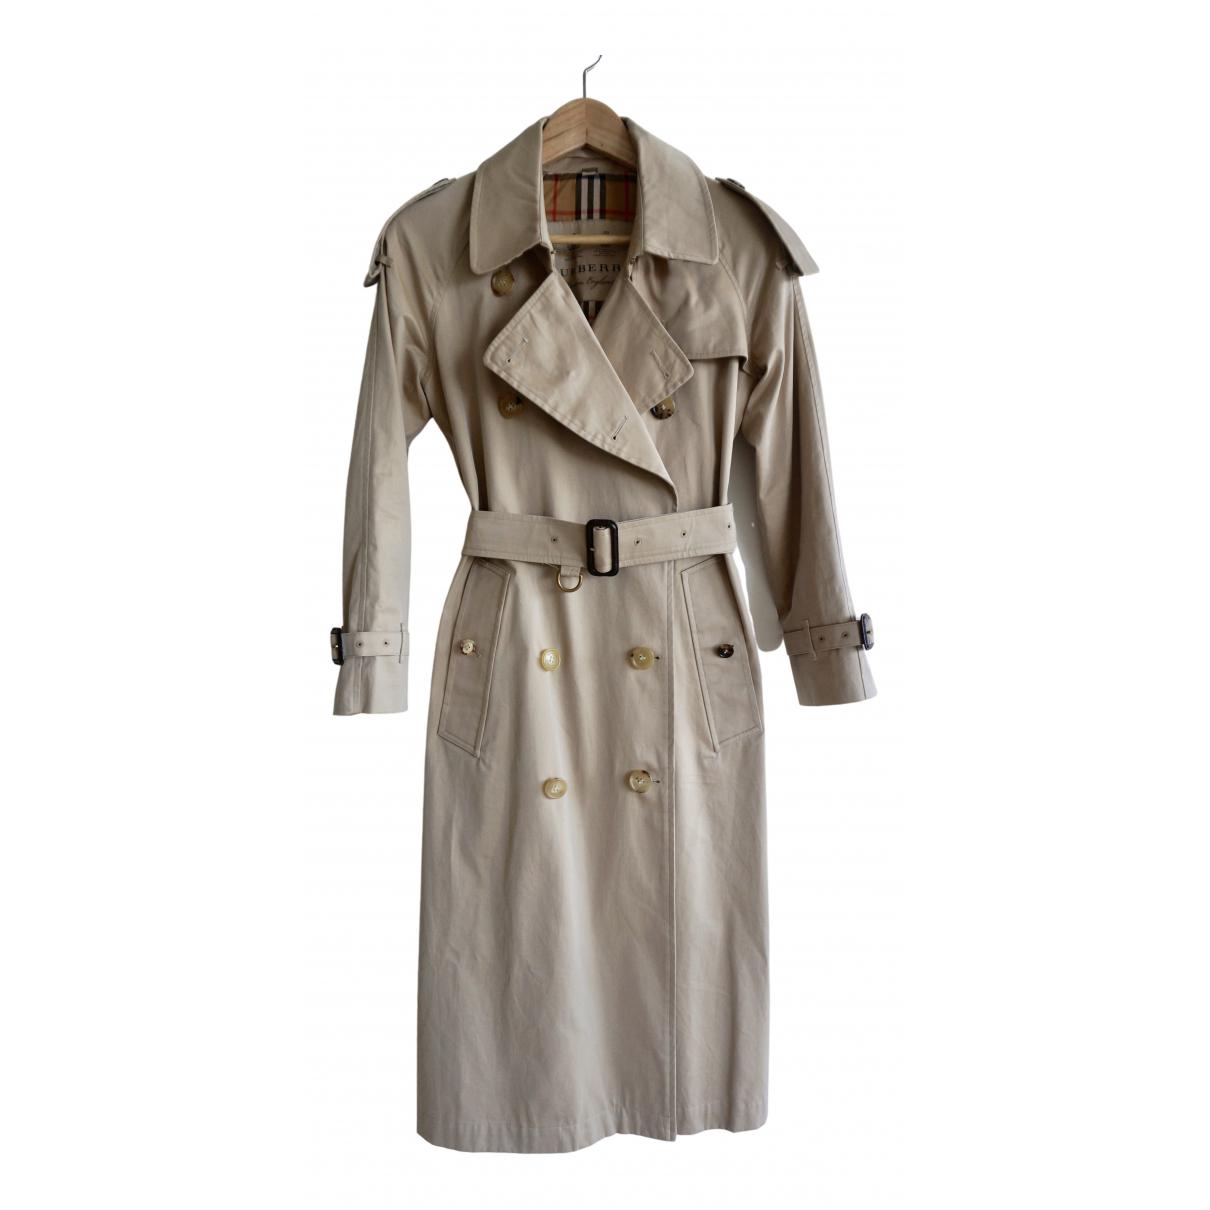 Burberry \N Beige Cotton Trench coat for Women 4 UK